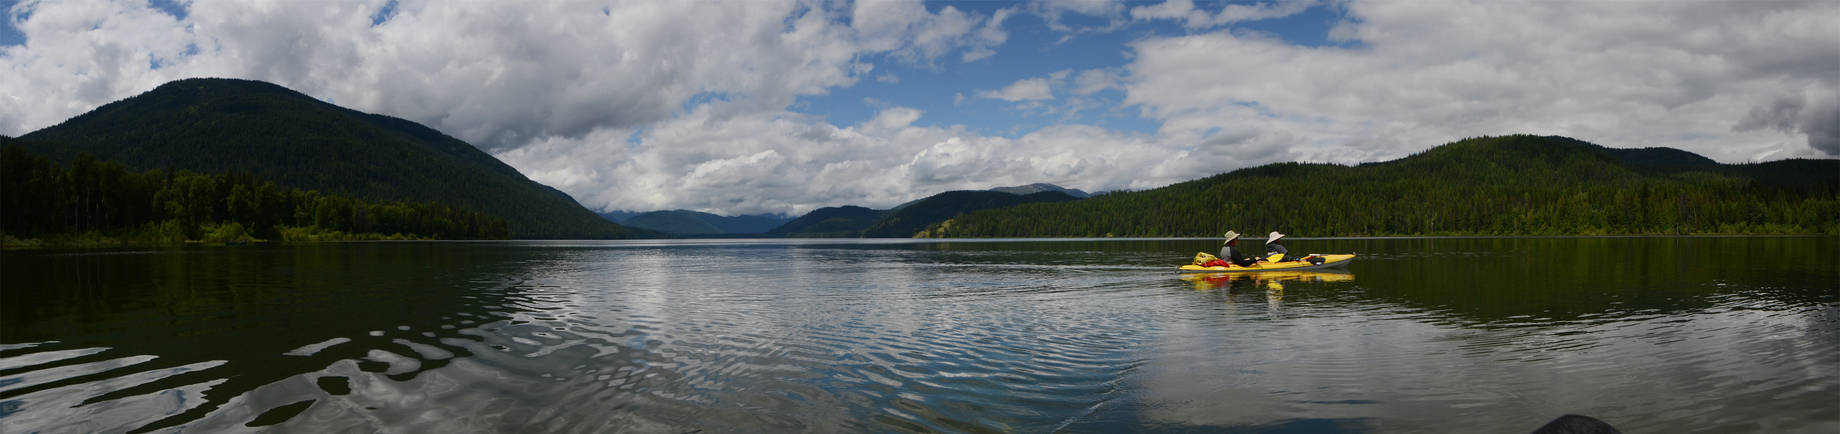 Upper Priest Lake 2012-06-26 2